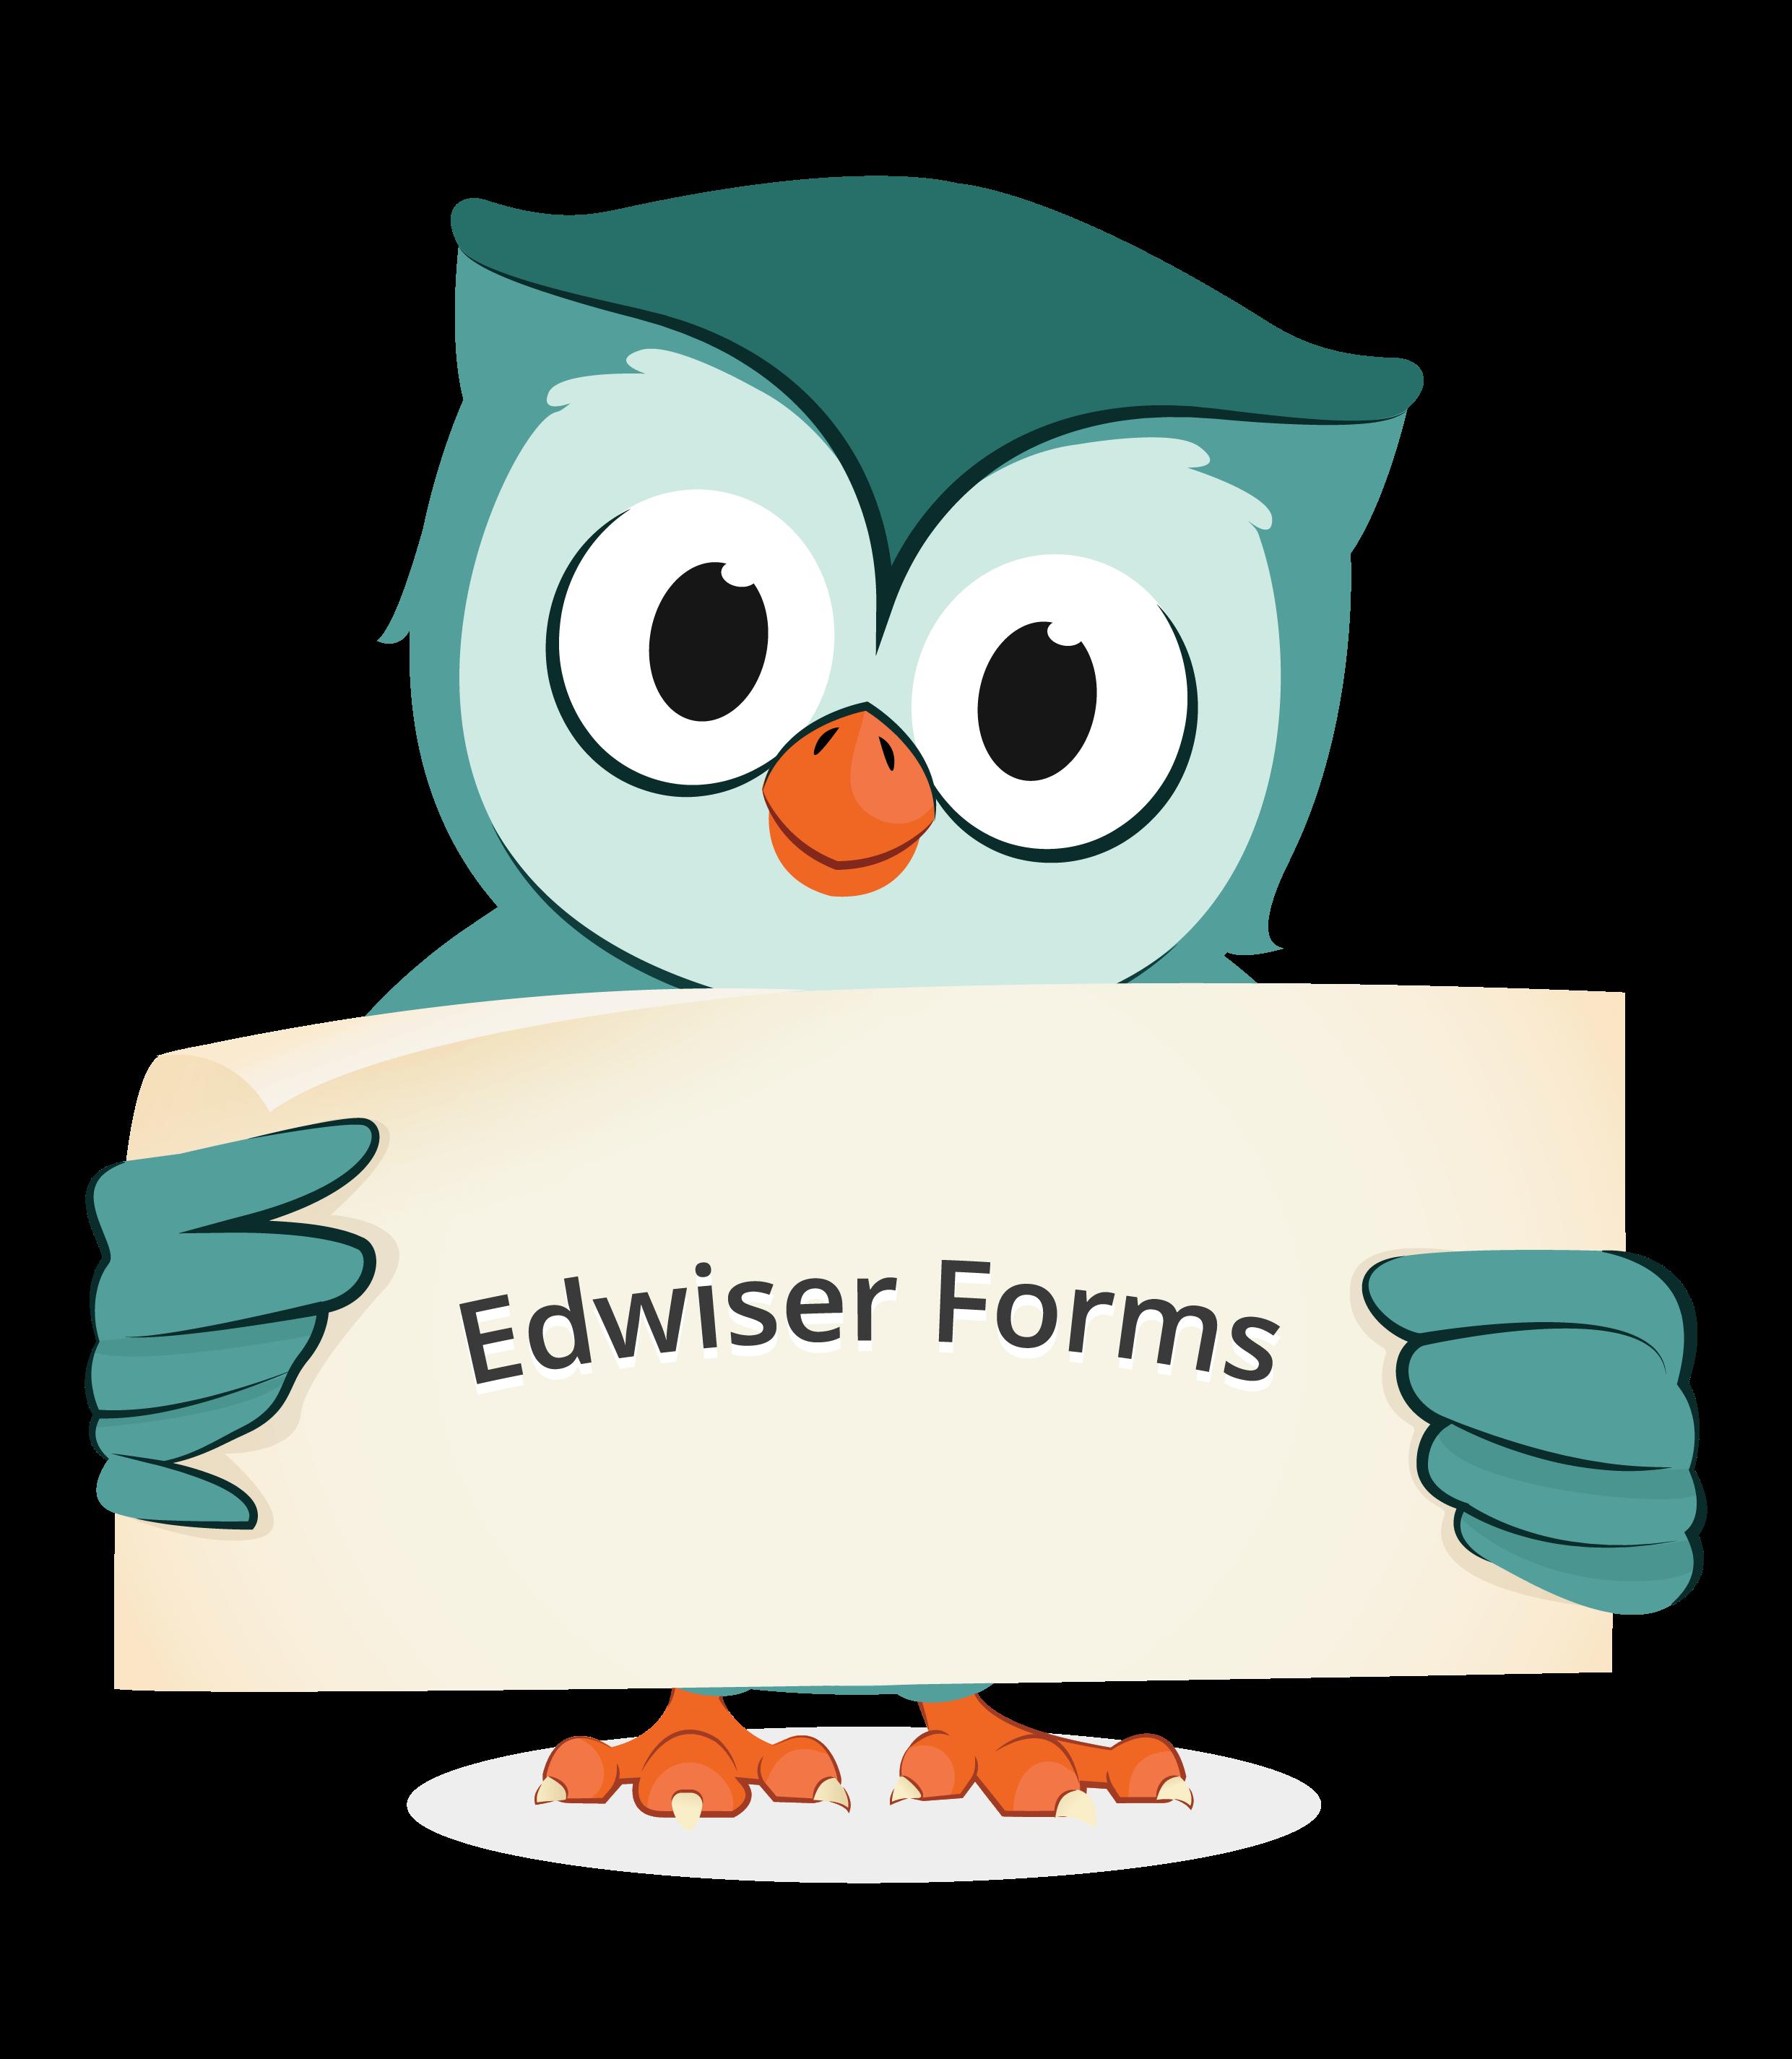 Edwiser Forms